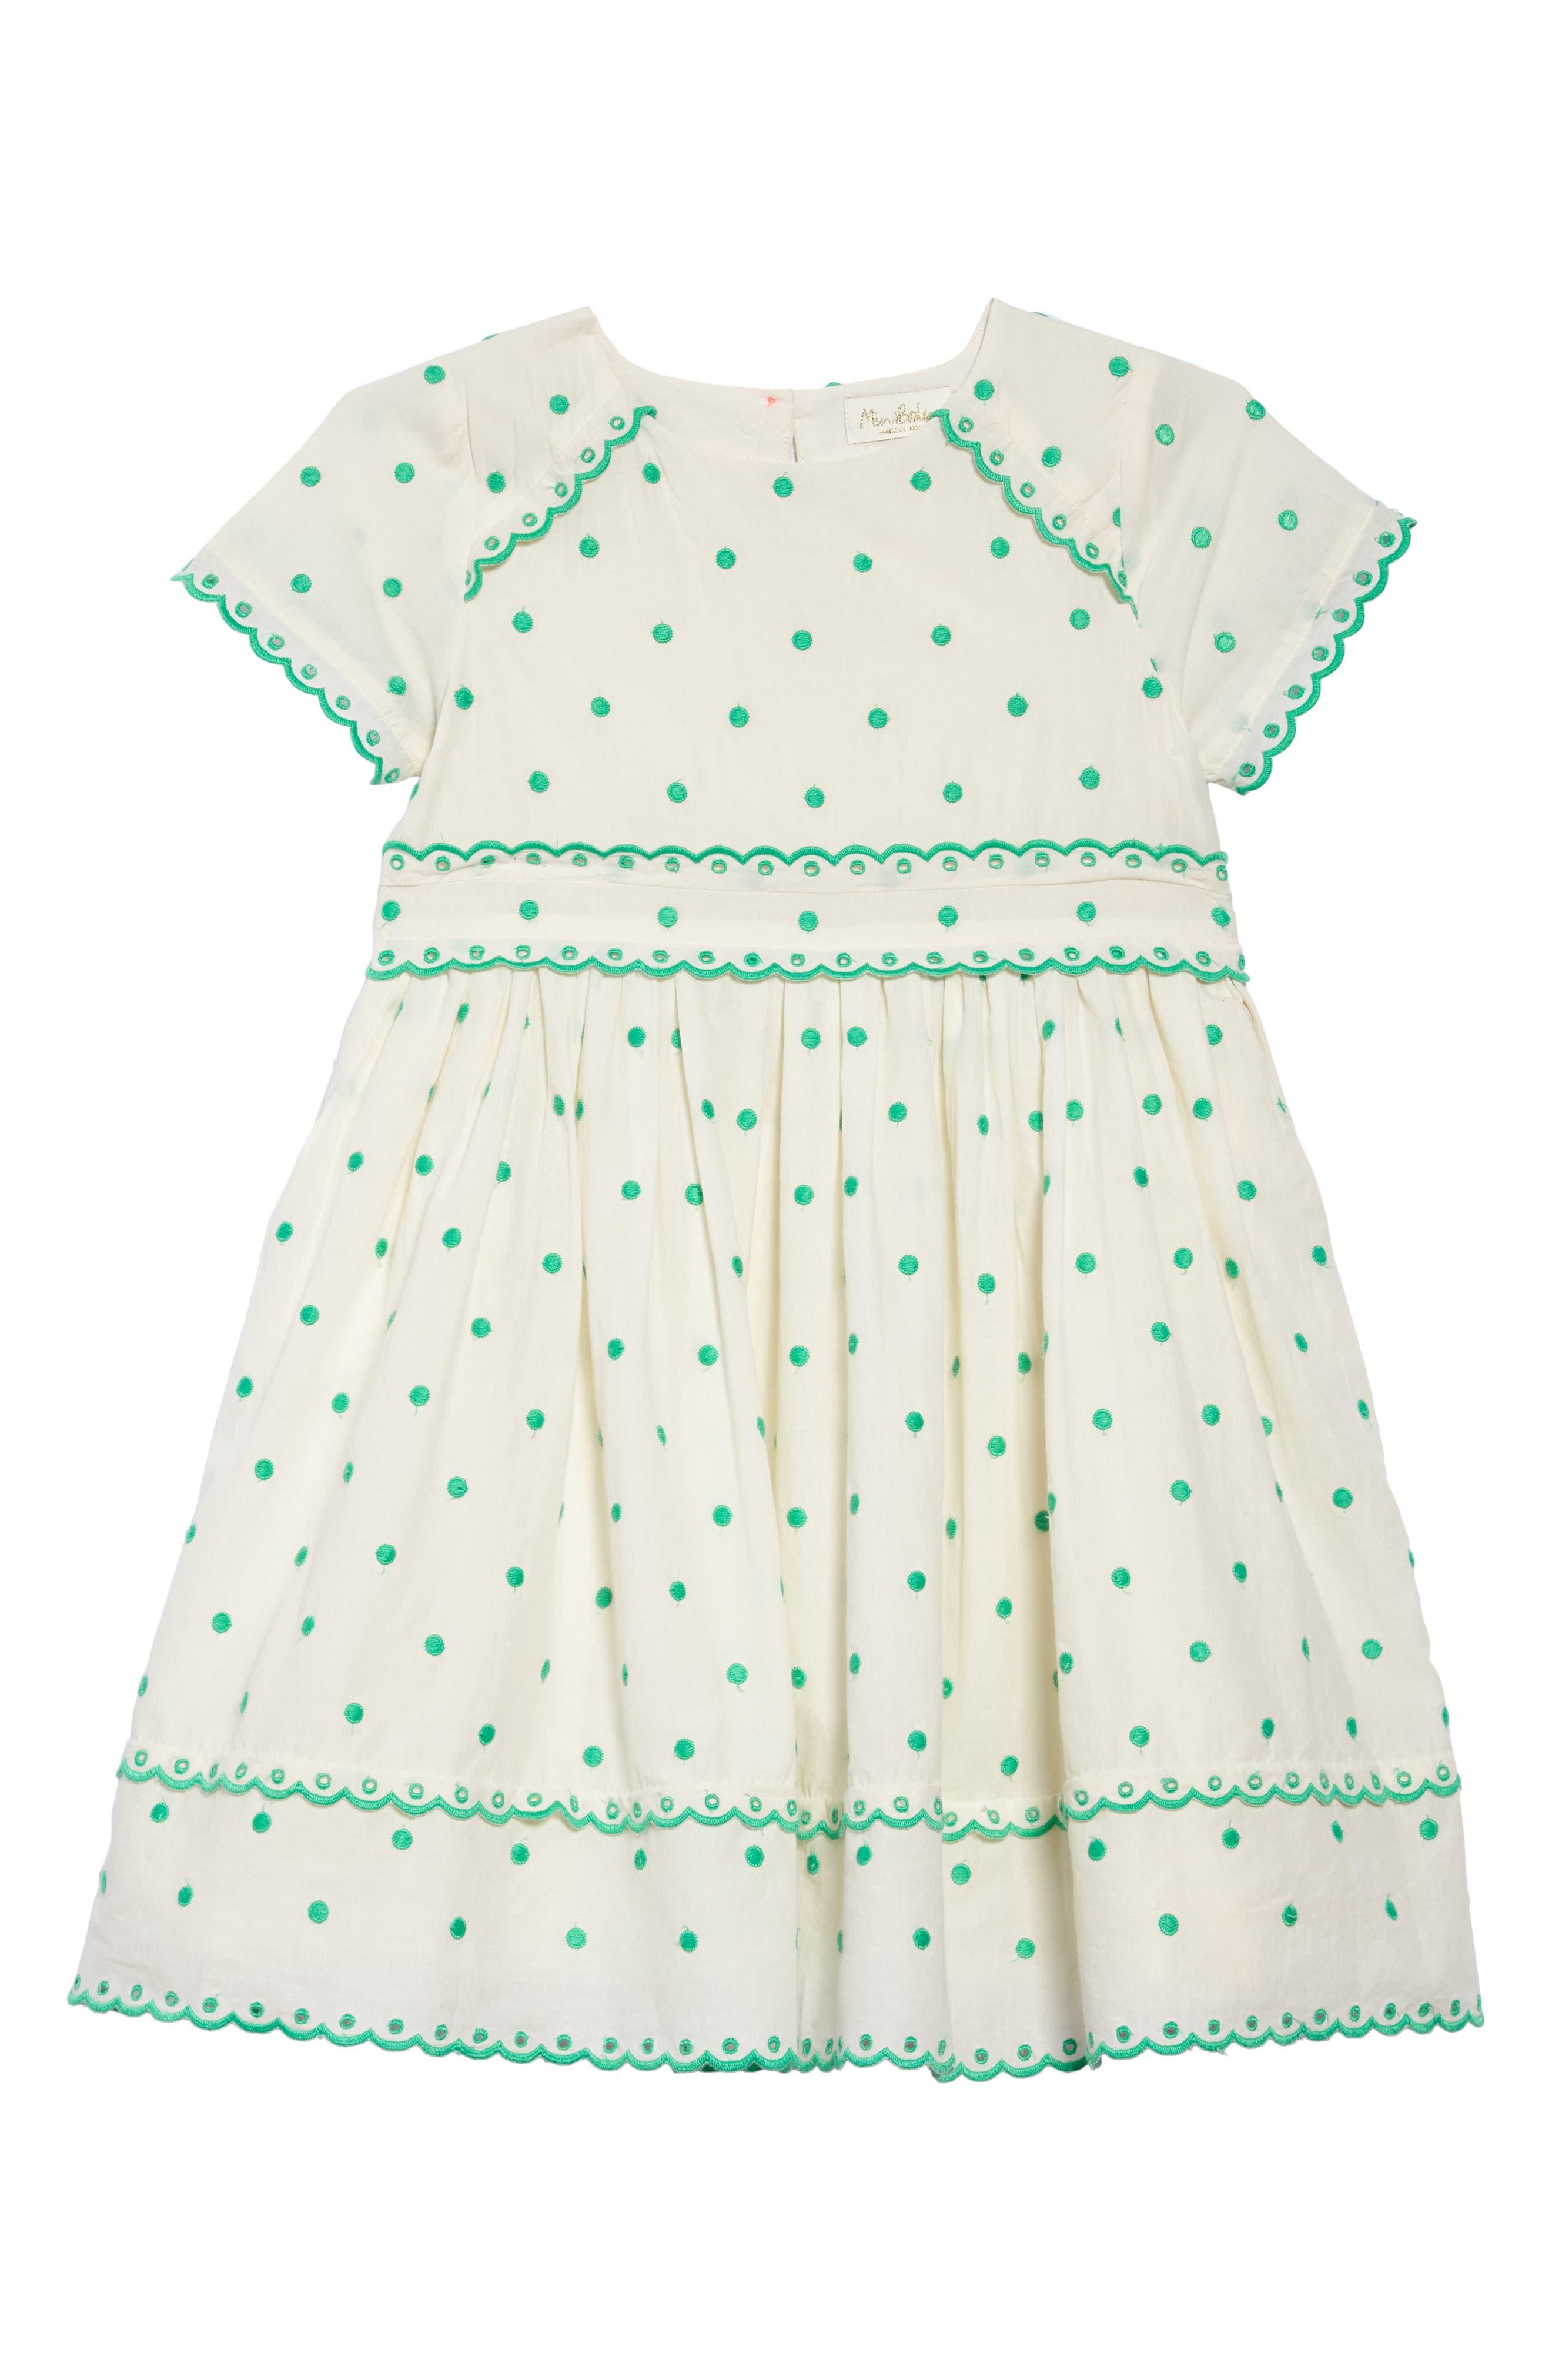 Main Image - Mini Boden Embroidered Dot Scalloped Dress (Toddler Girls, Little Girls & Big Girls)